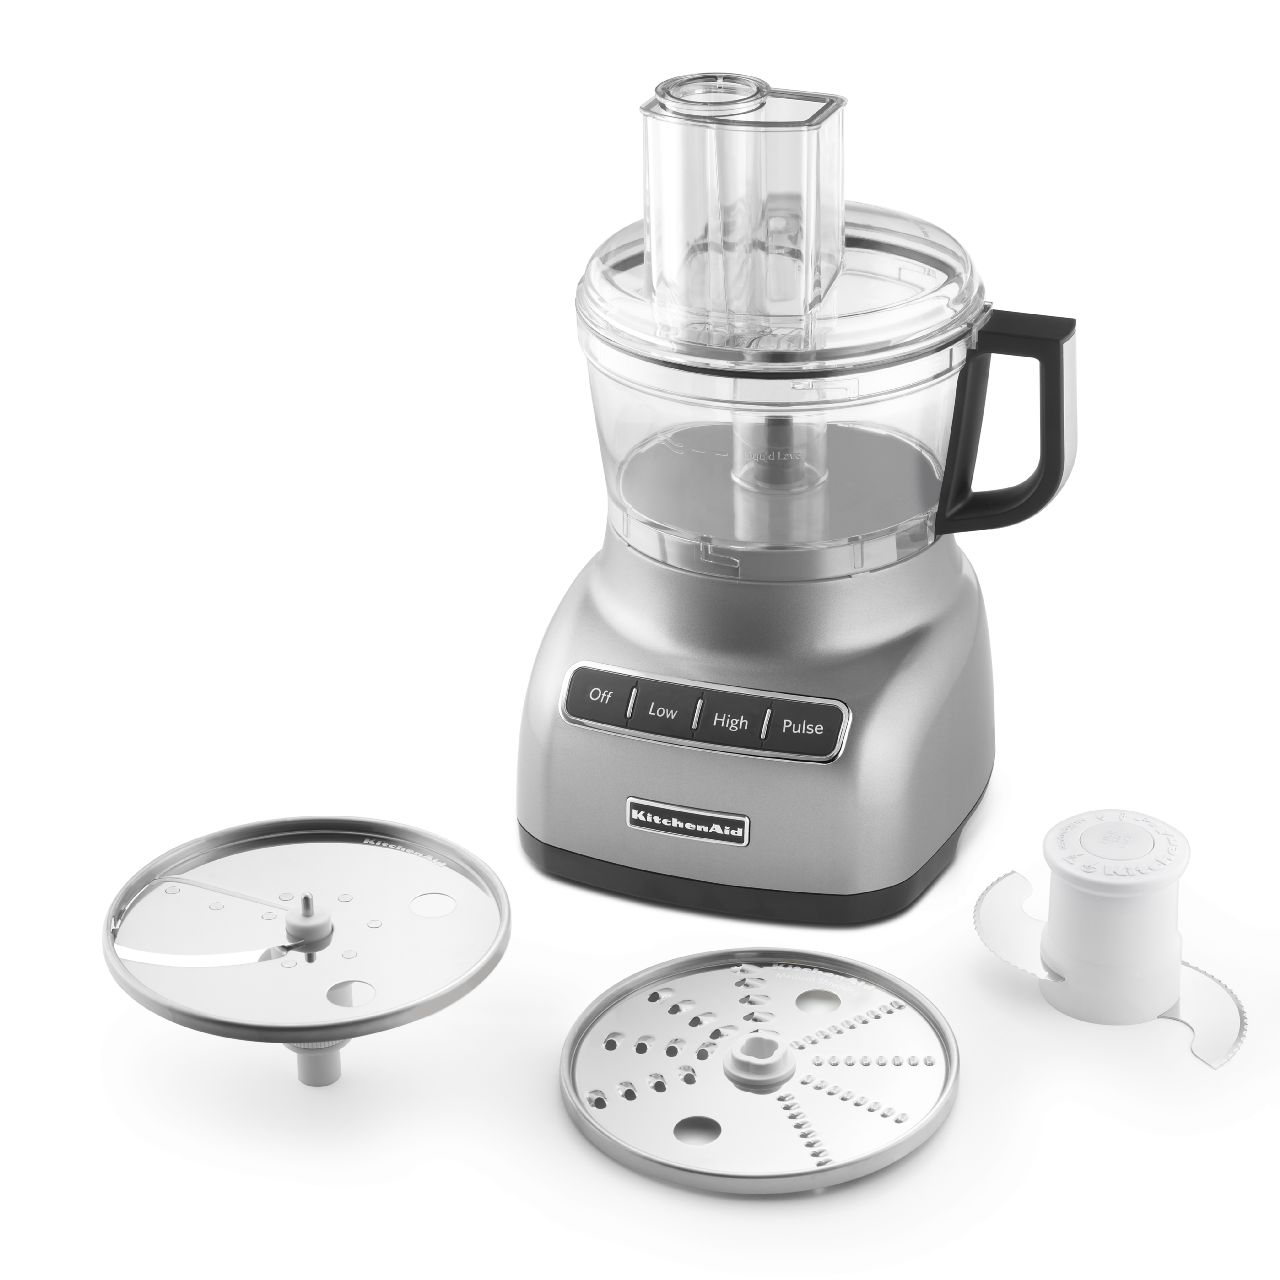 KitchenAid-7-Cup-Food-Processor thumbnail 3